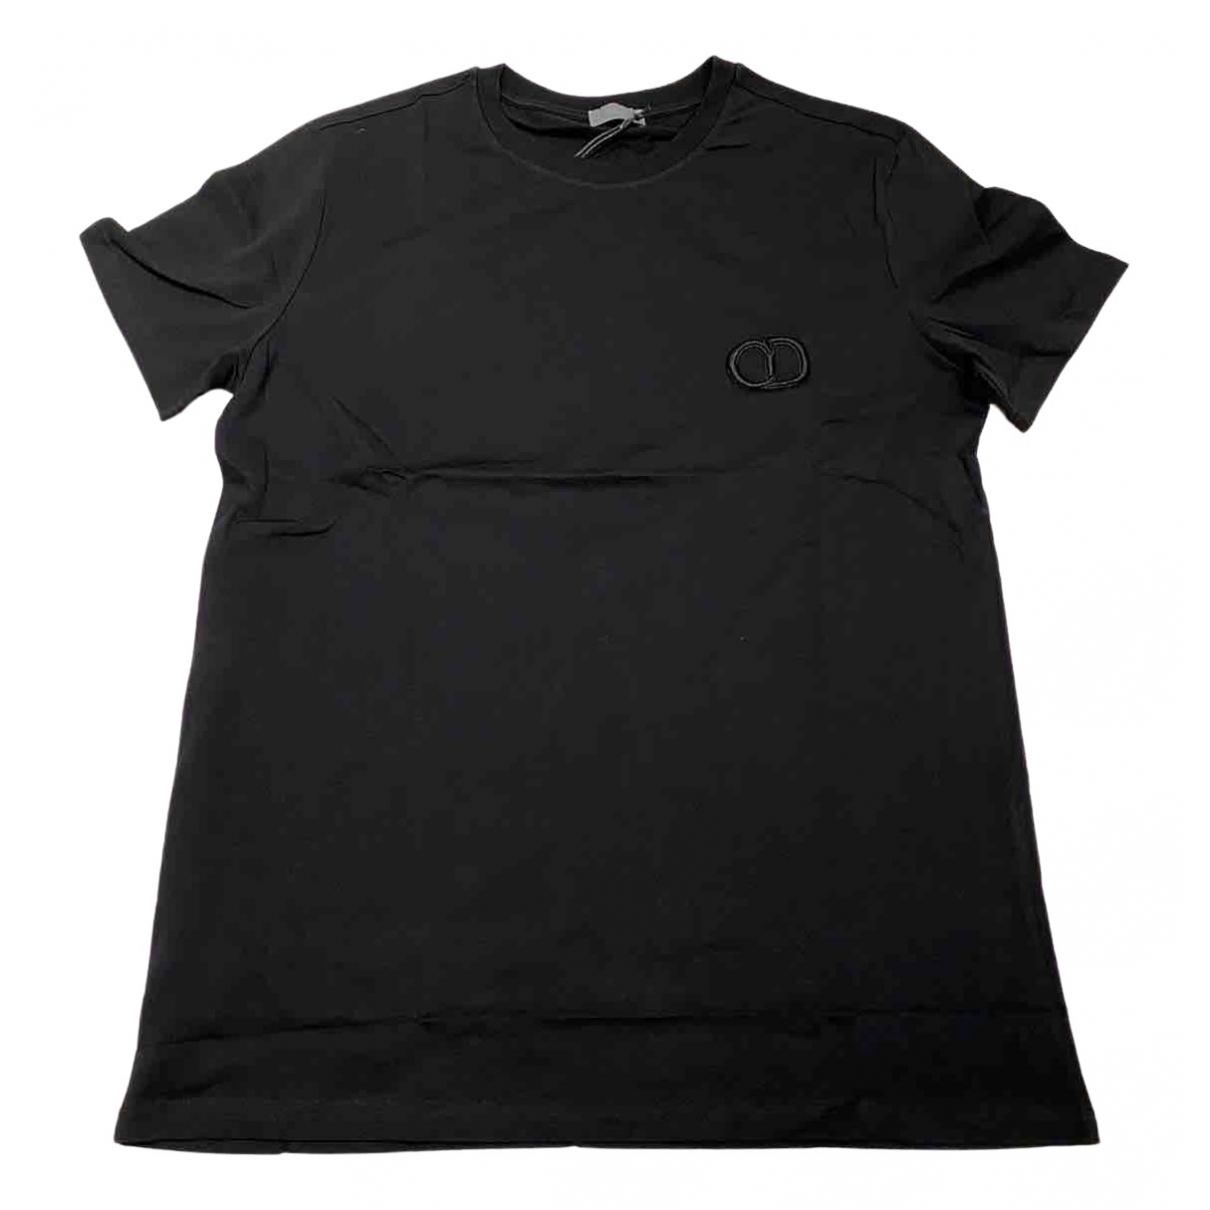 Dior Homme \N Black Cotton T-shirts for Men M International